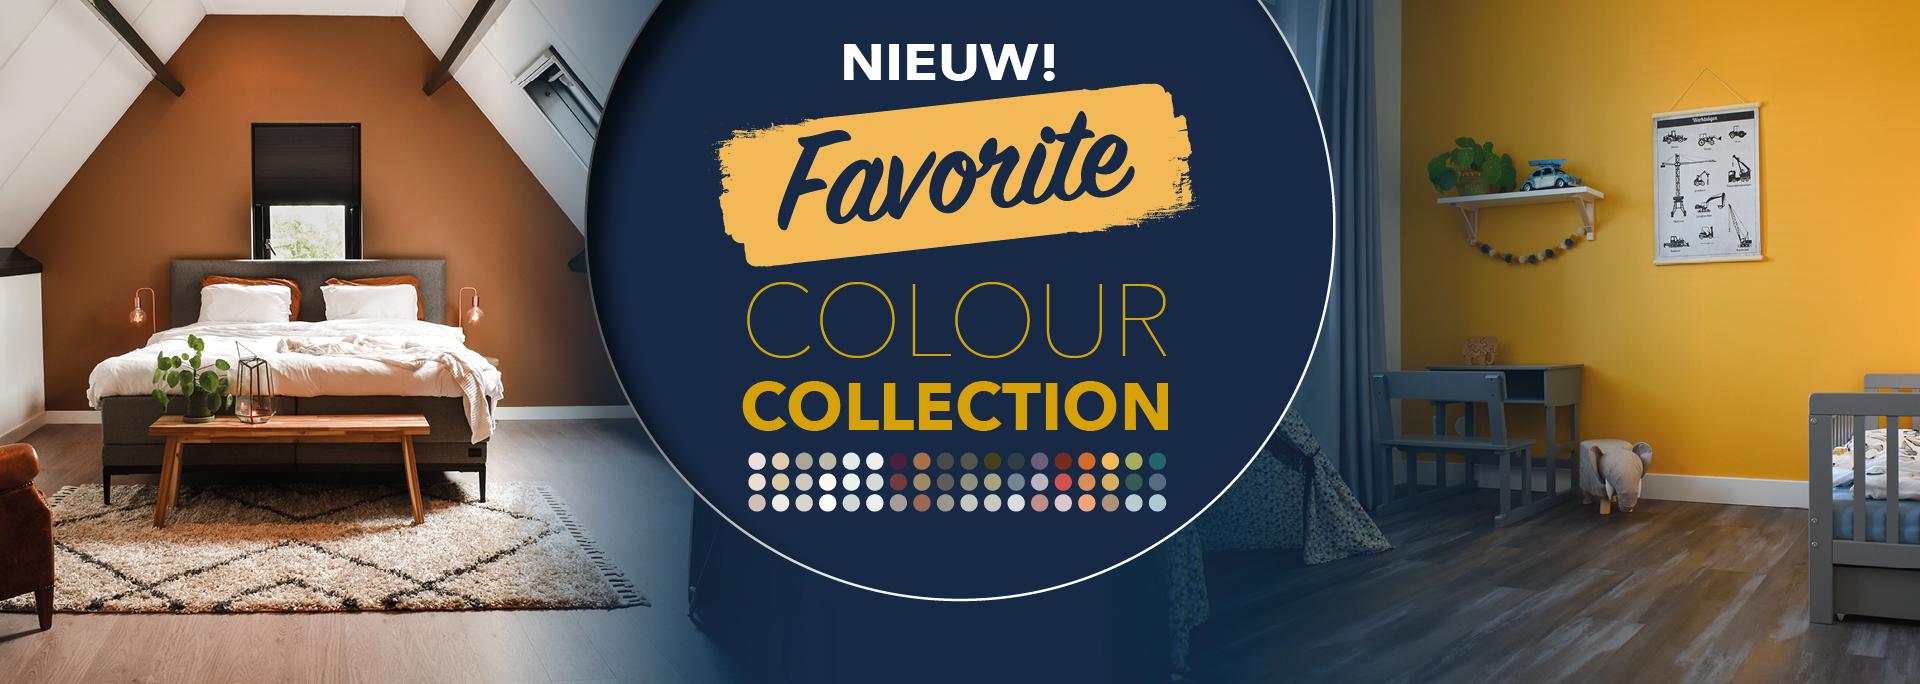 Kleurencollectie Anker Stuy Favortie Colour Collection